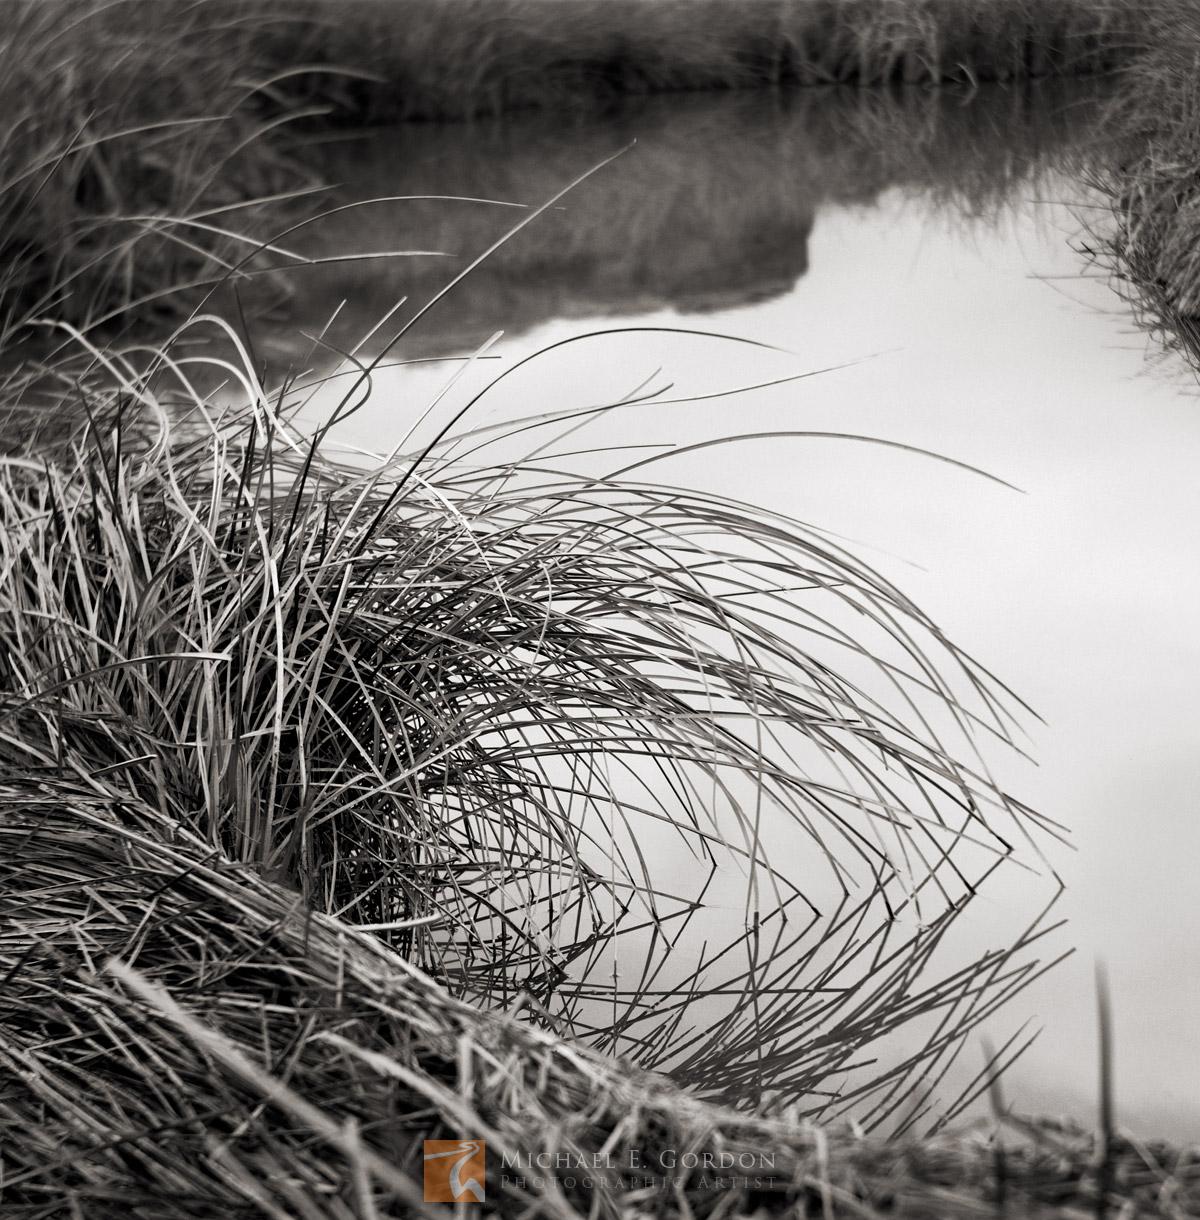 riverside, quiet, cattail, Typha angustifolia, curve, Amargosa, river, California, Mojave Desert, photo